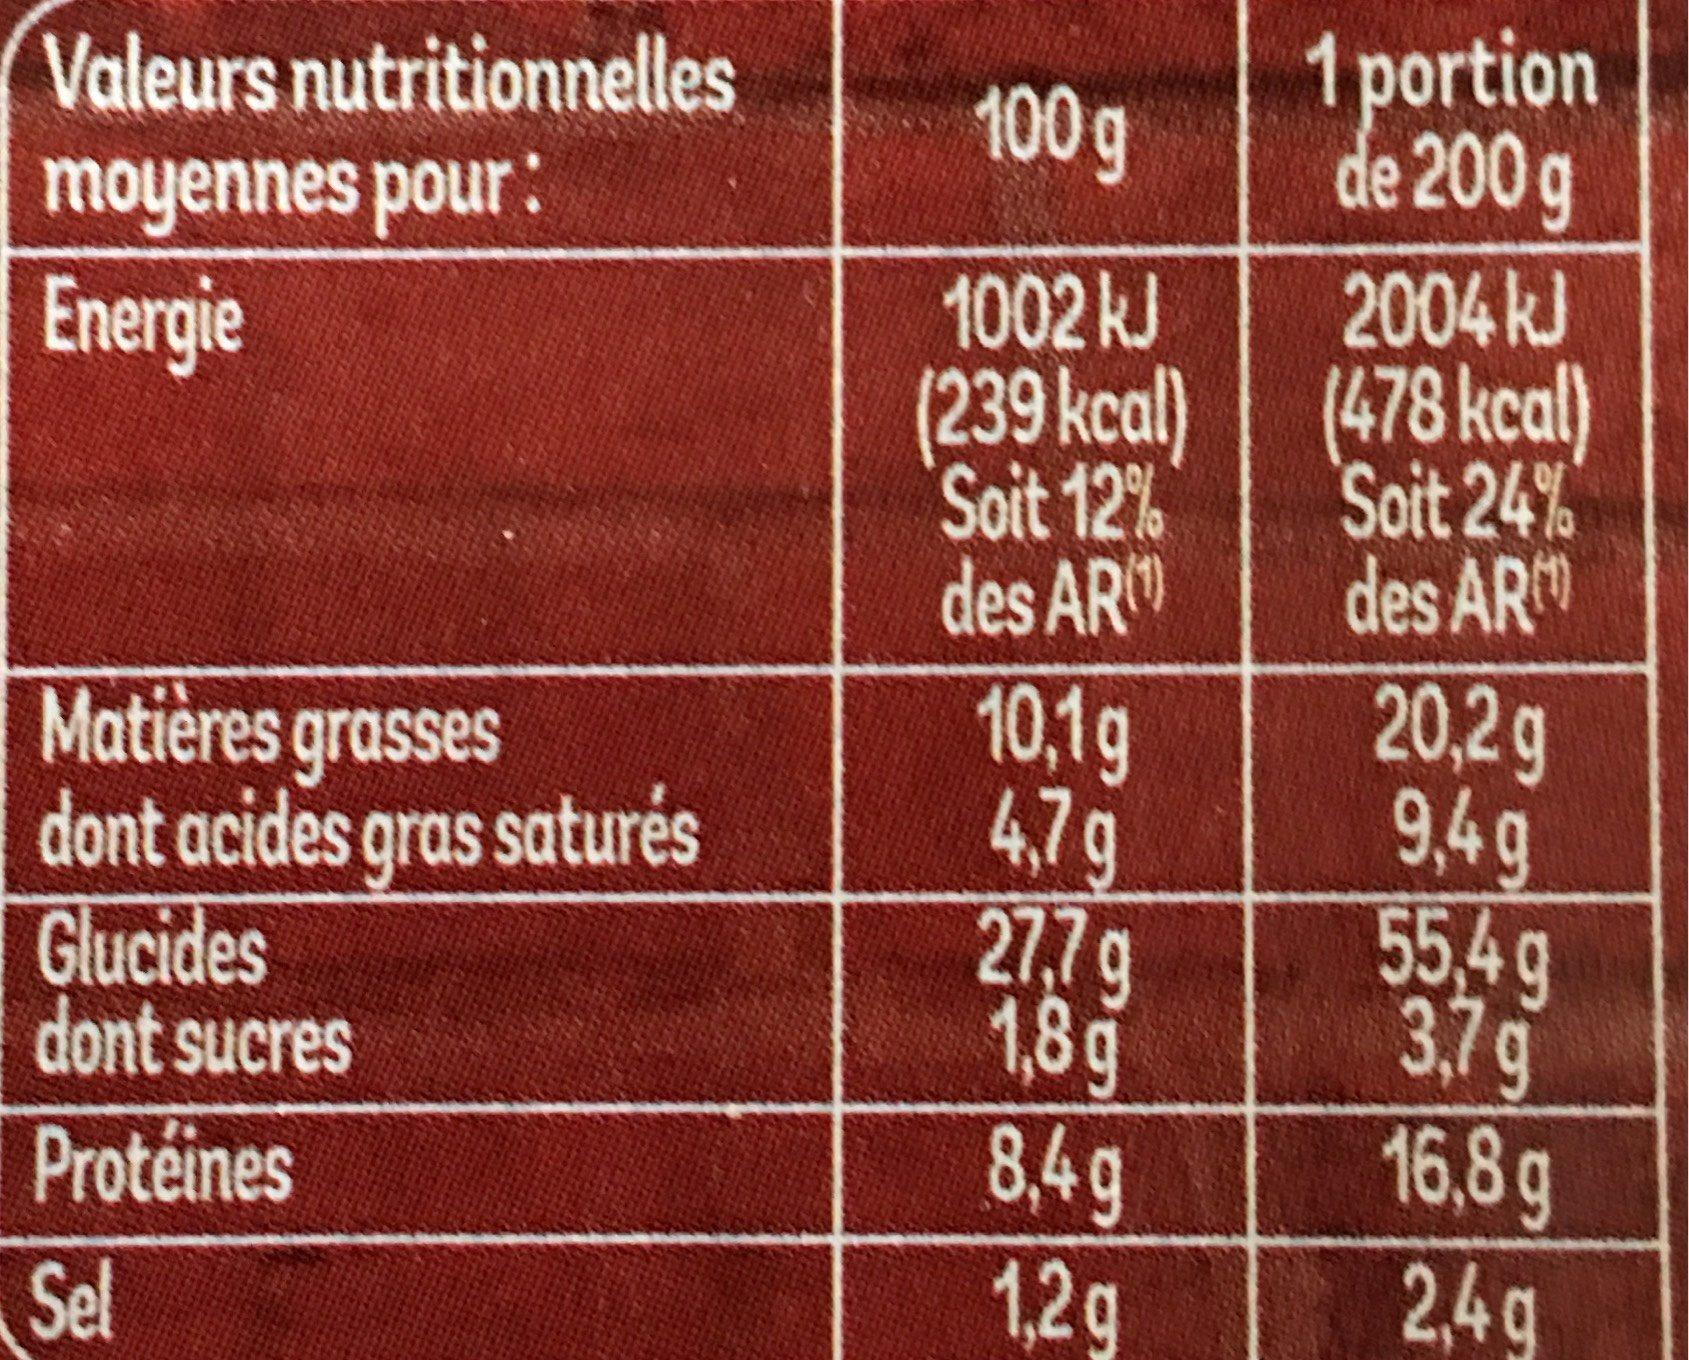 Fiorini chorizo 200g - Informations nutritionnelles - fr